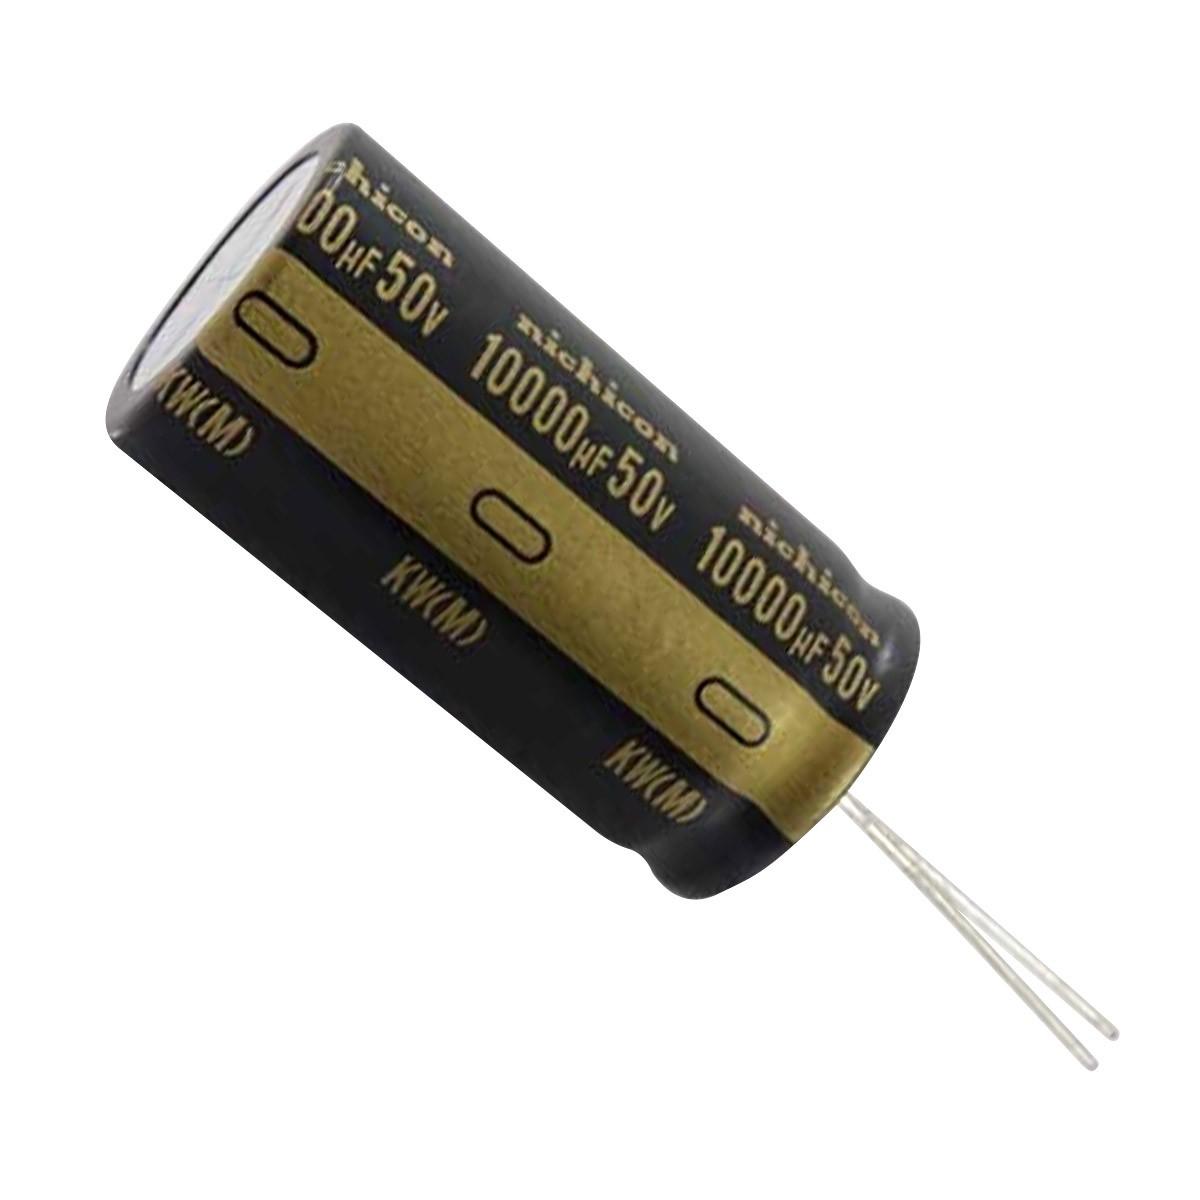 NICHICON KW Electrolytic Audio Capacitor 50V 4700μF